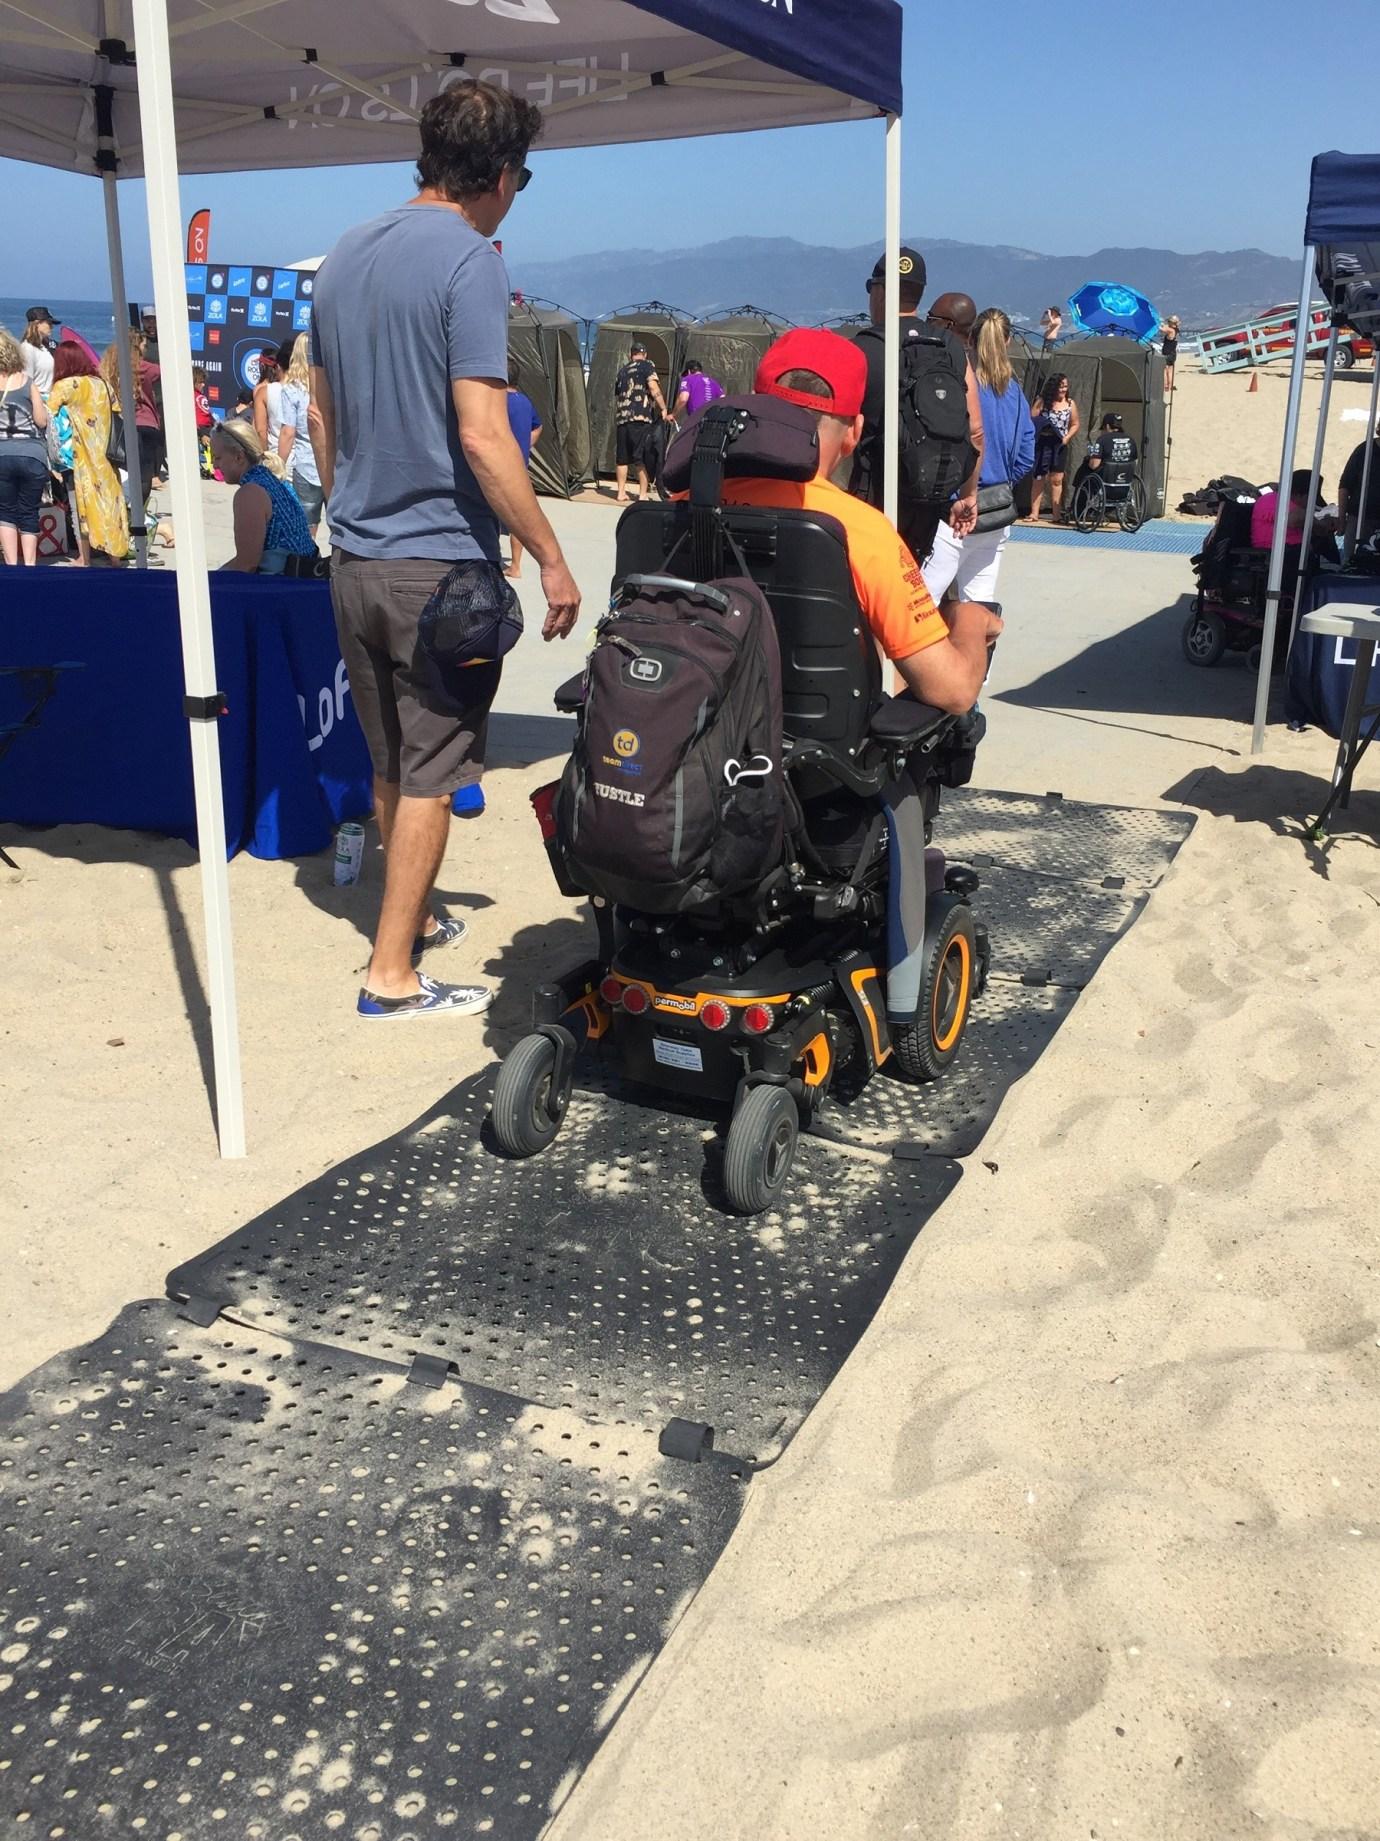 beach-trax-life-rolls-on-santa-monica-2018-2